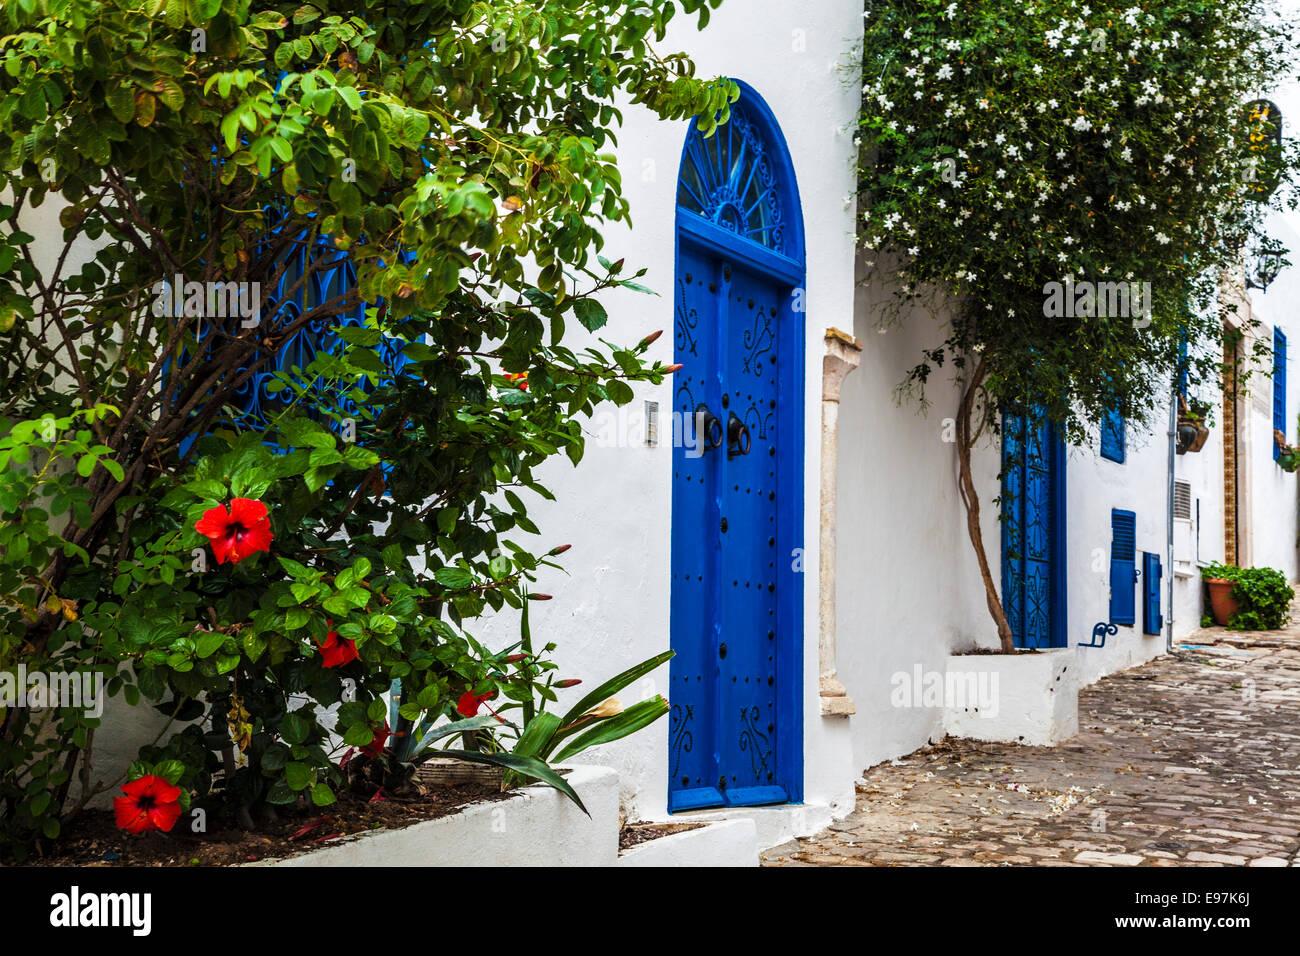 Narrow cobbled street in Sidi Bou Said, Tunisia. Stock Photo